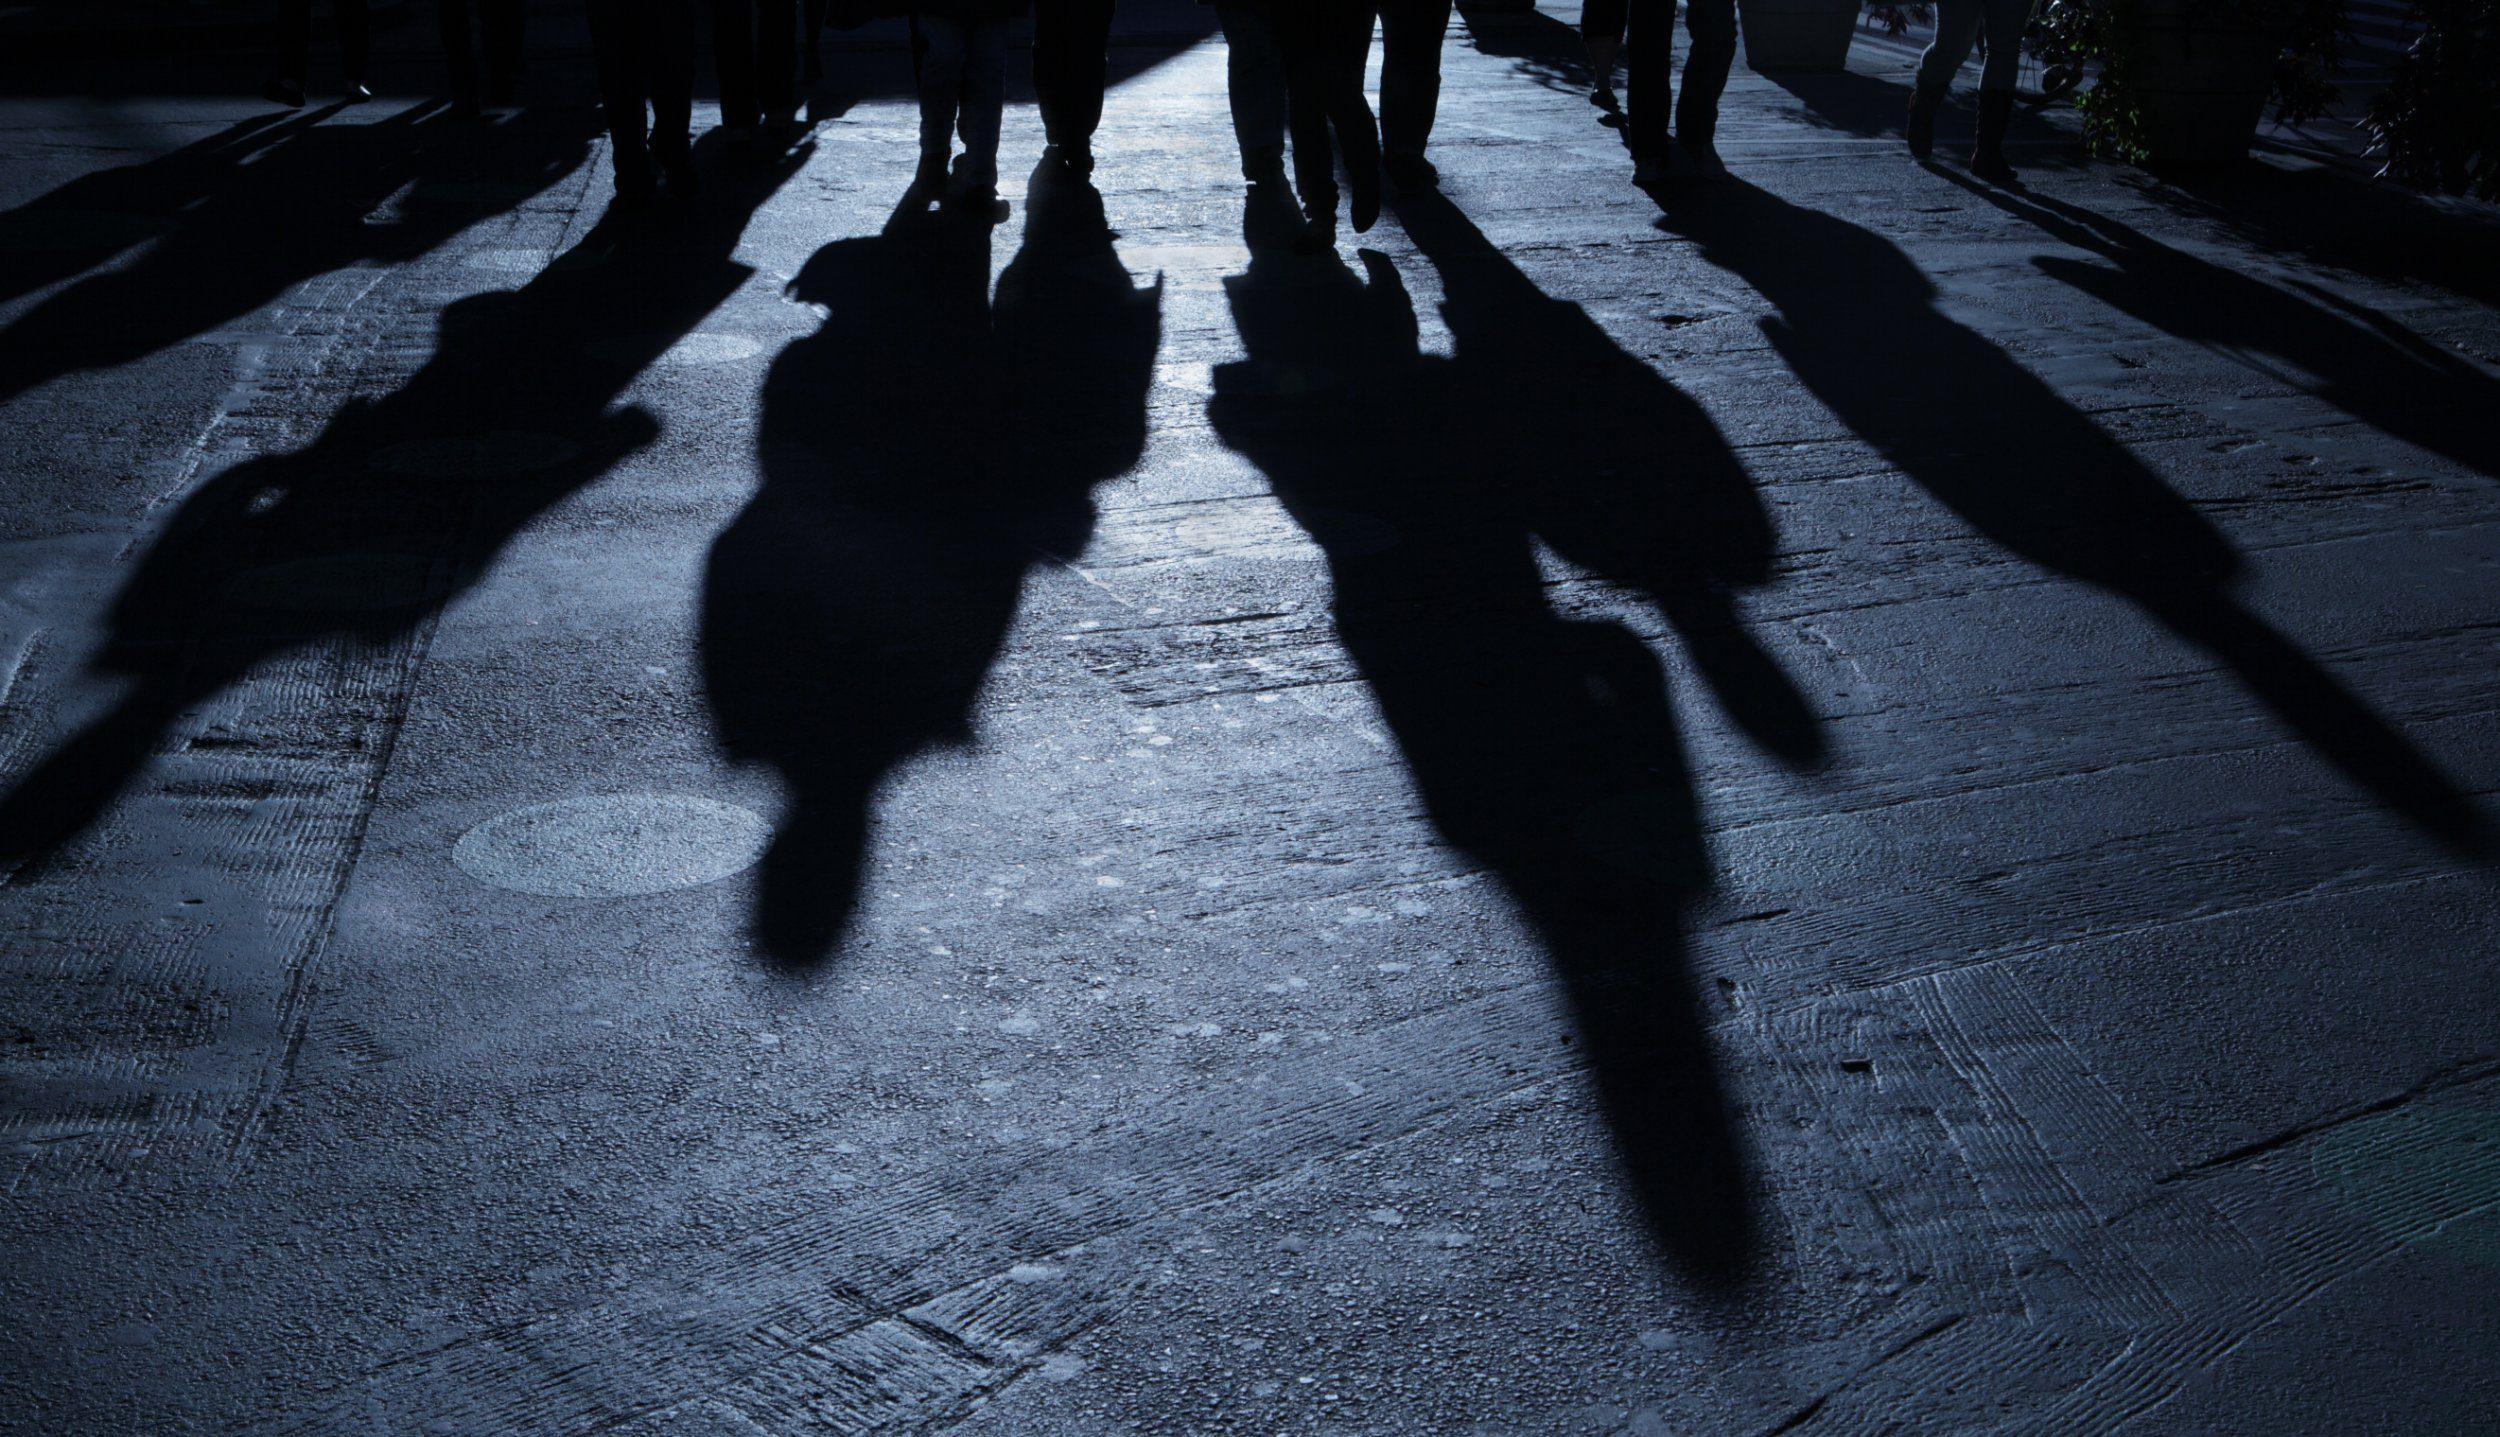 Ex-gang member warns more attacks in London could be coming